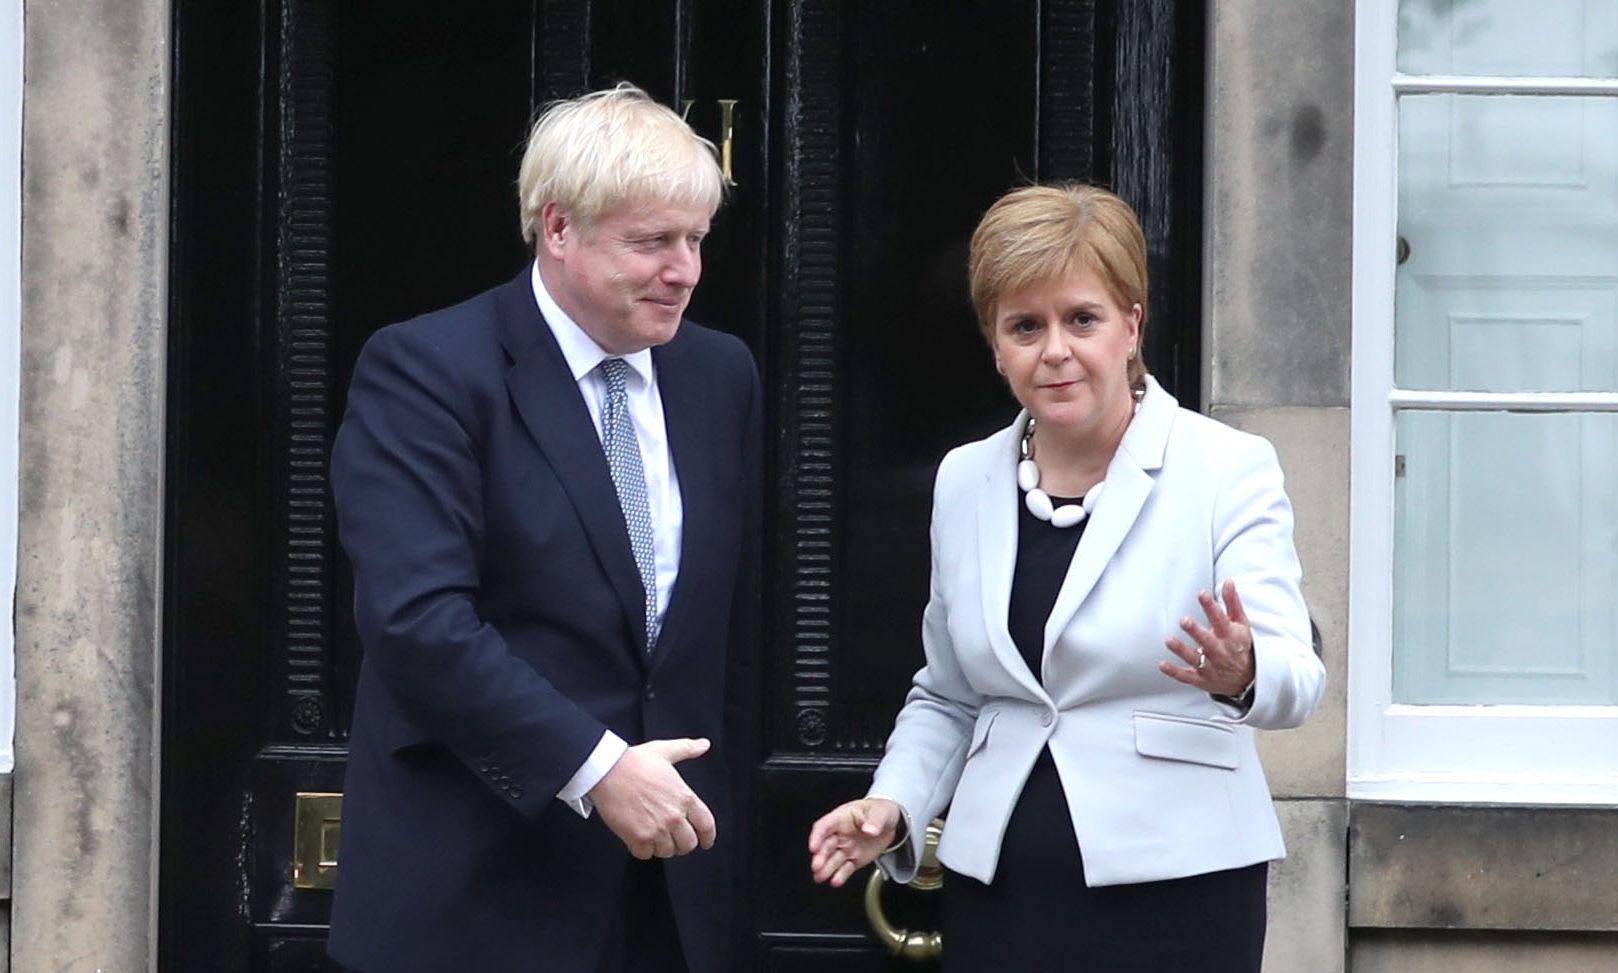 Scotland's First Minister Nicola Sturgeon welcomes Prime Minister Boris Johnson outside Bute House in Edinburgh in July 2019.